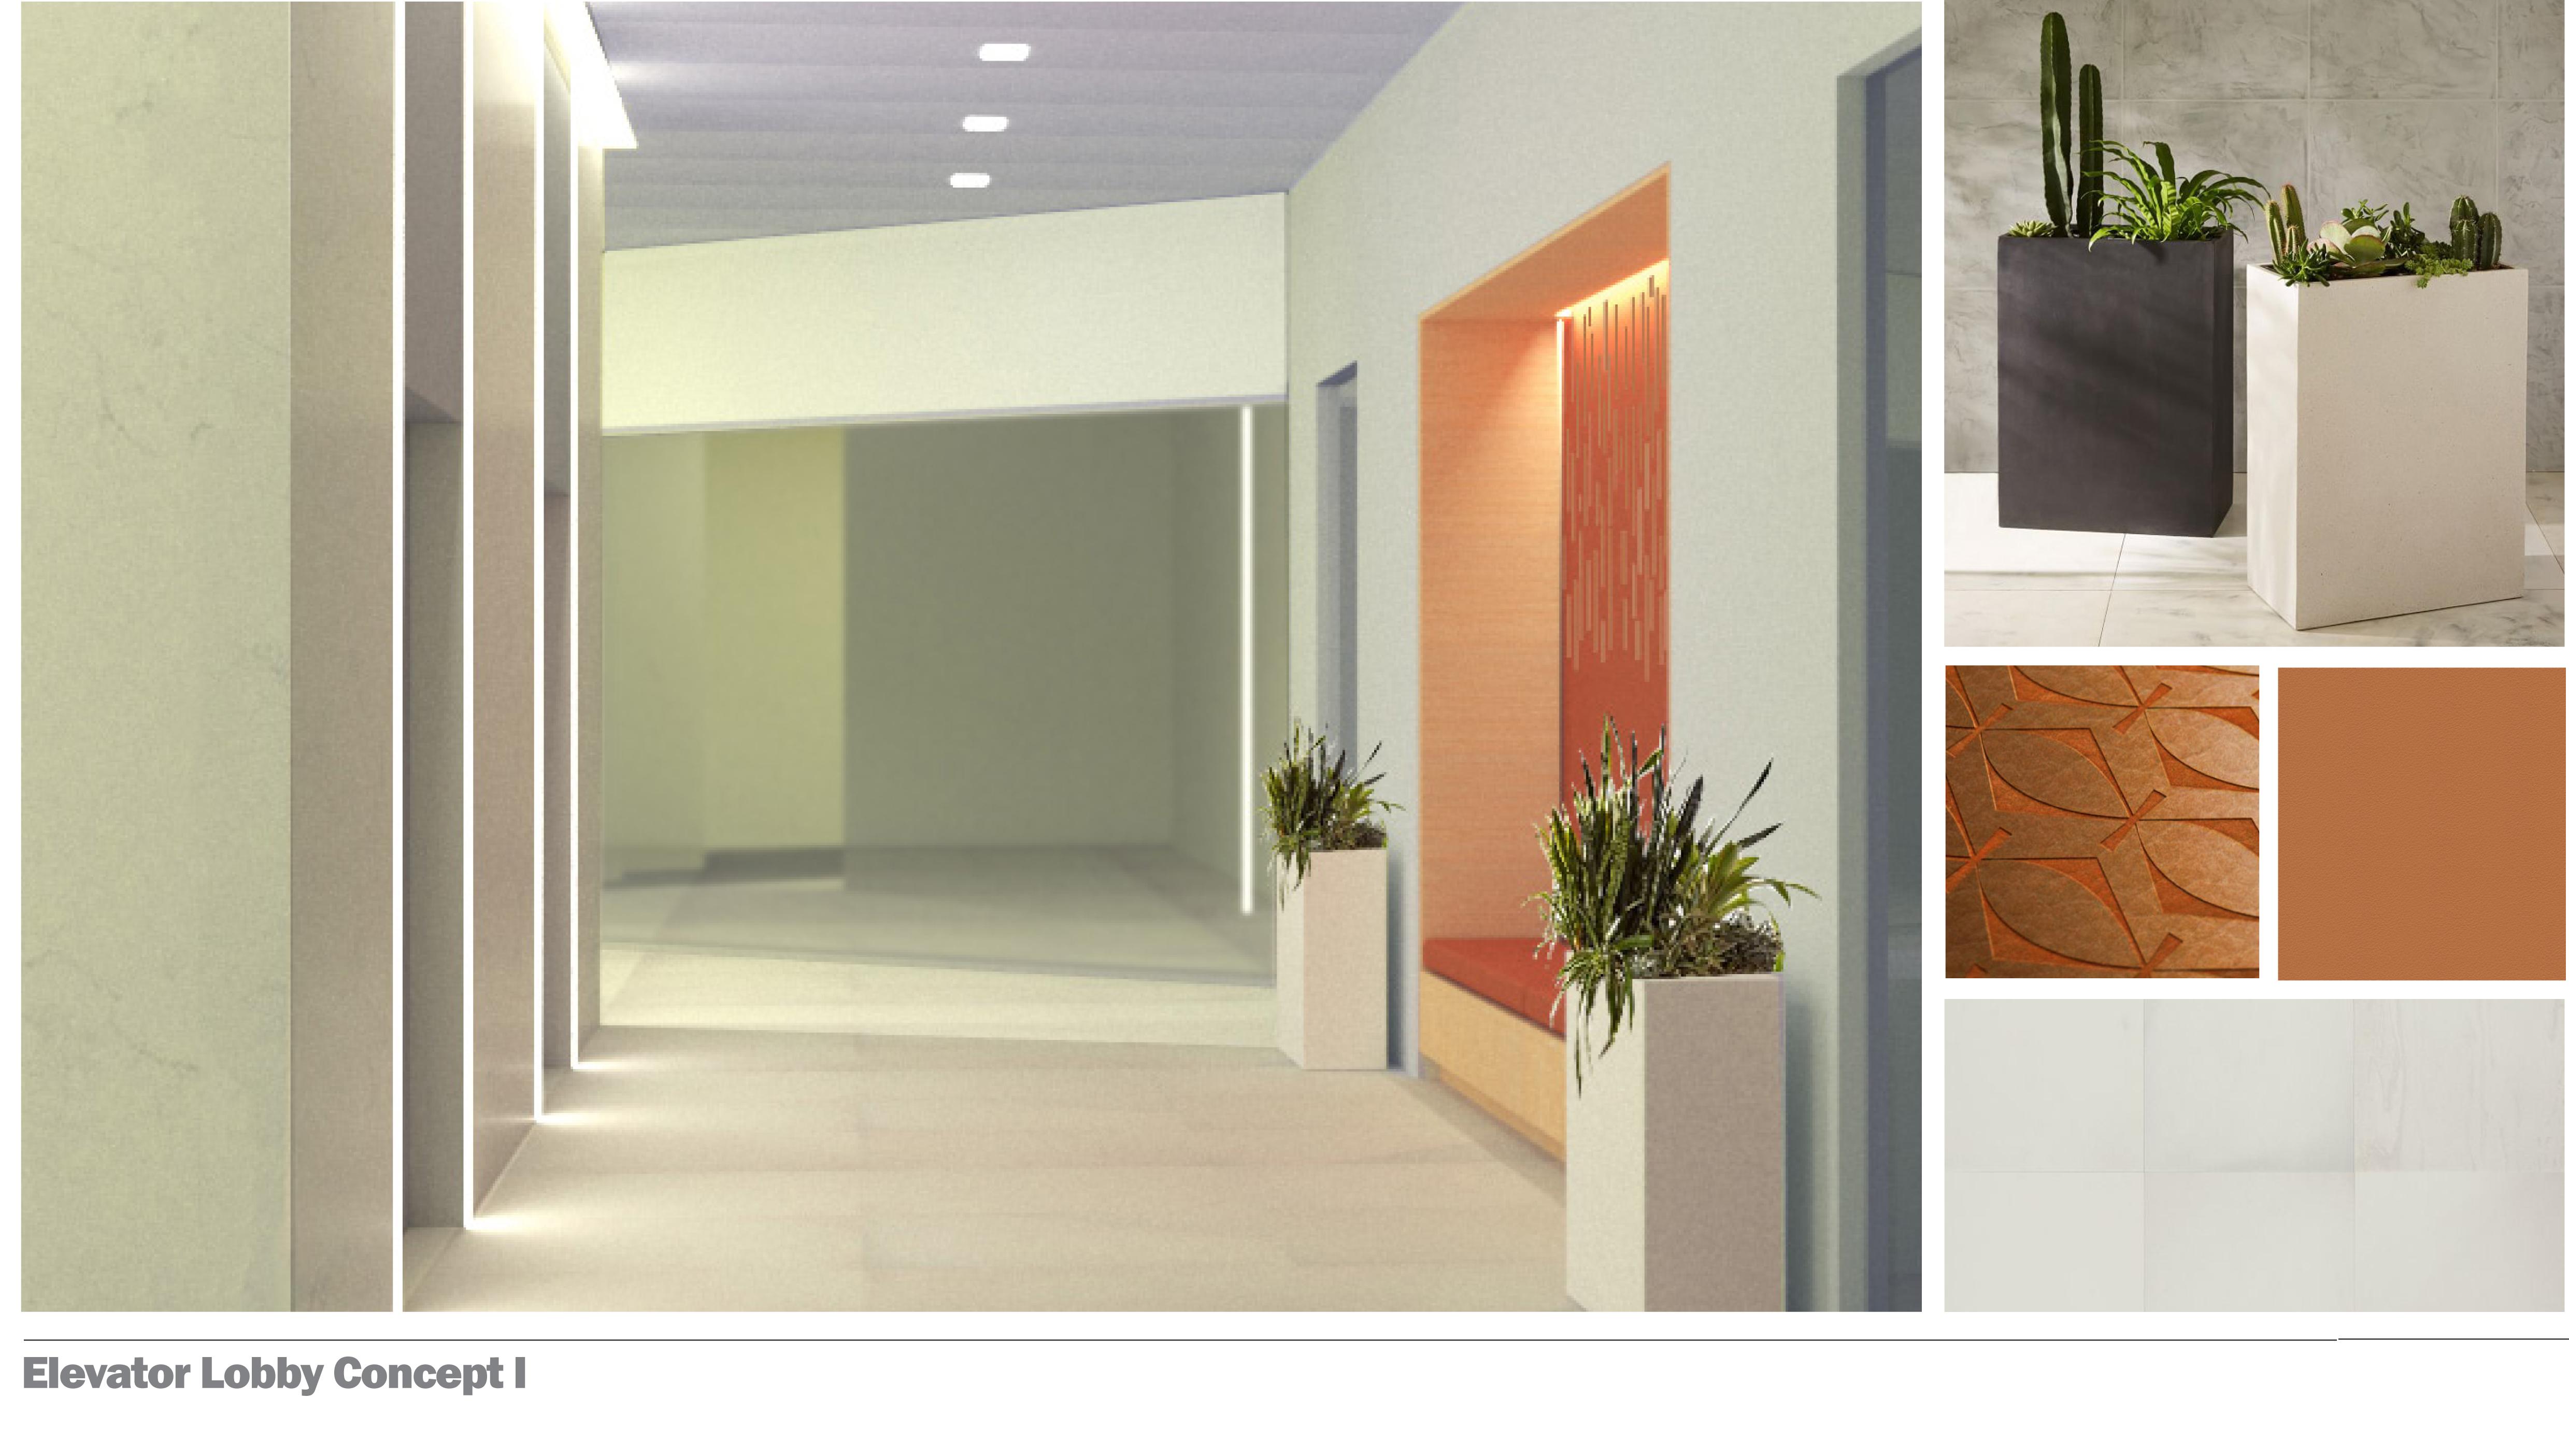 Eevator Lobby Concept I